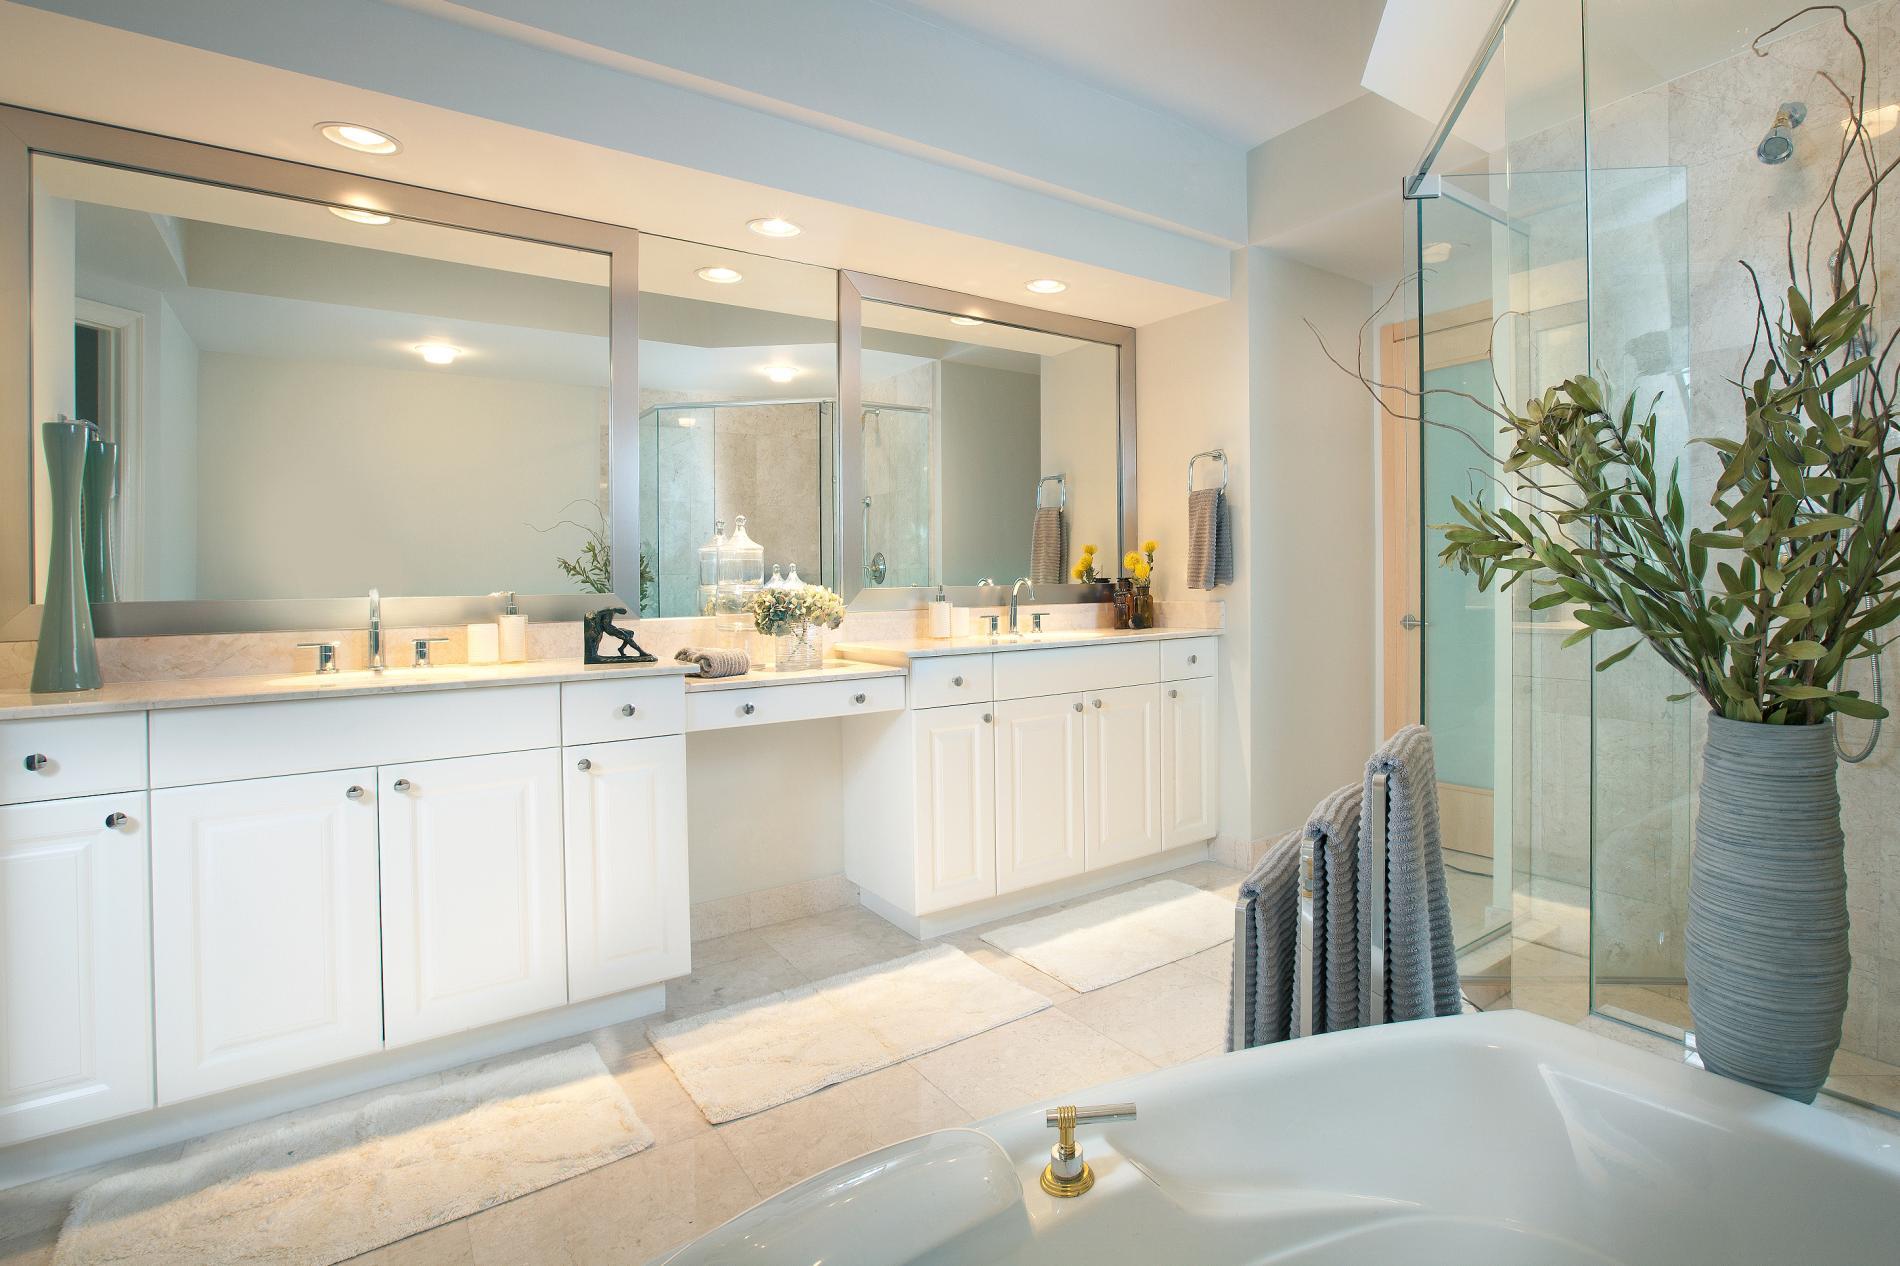 дизайн интерьера ванной комнаты.jpg